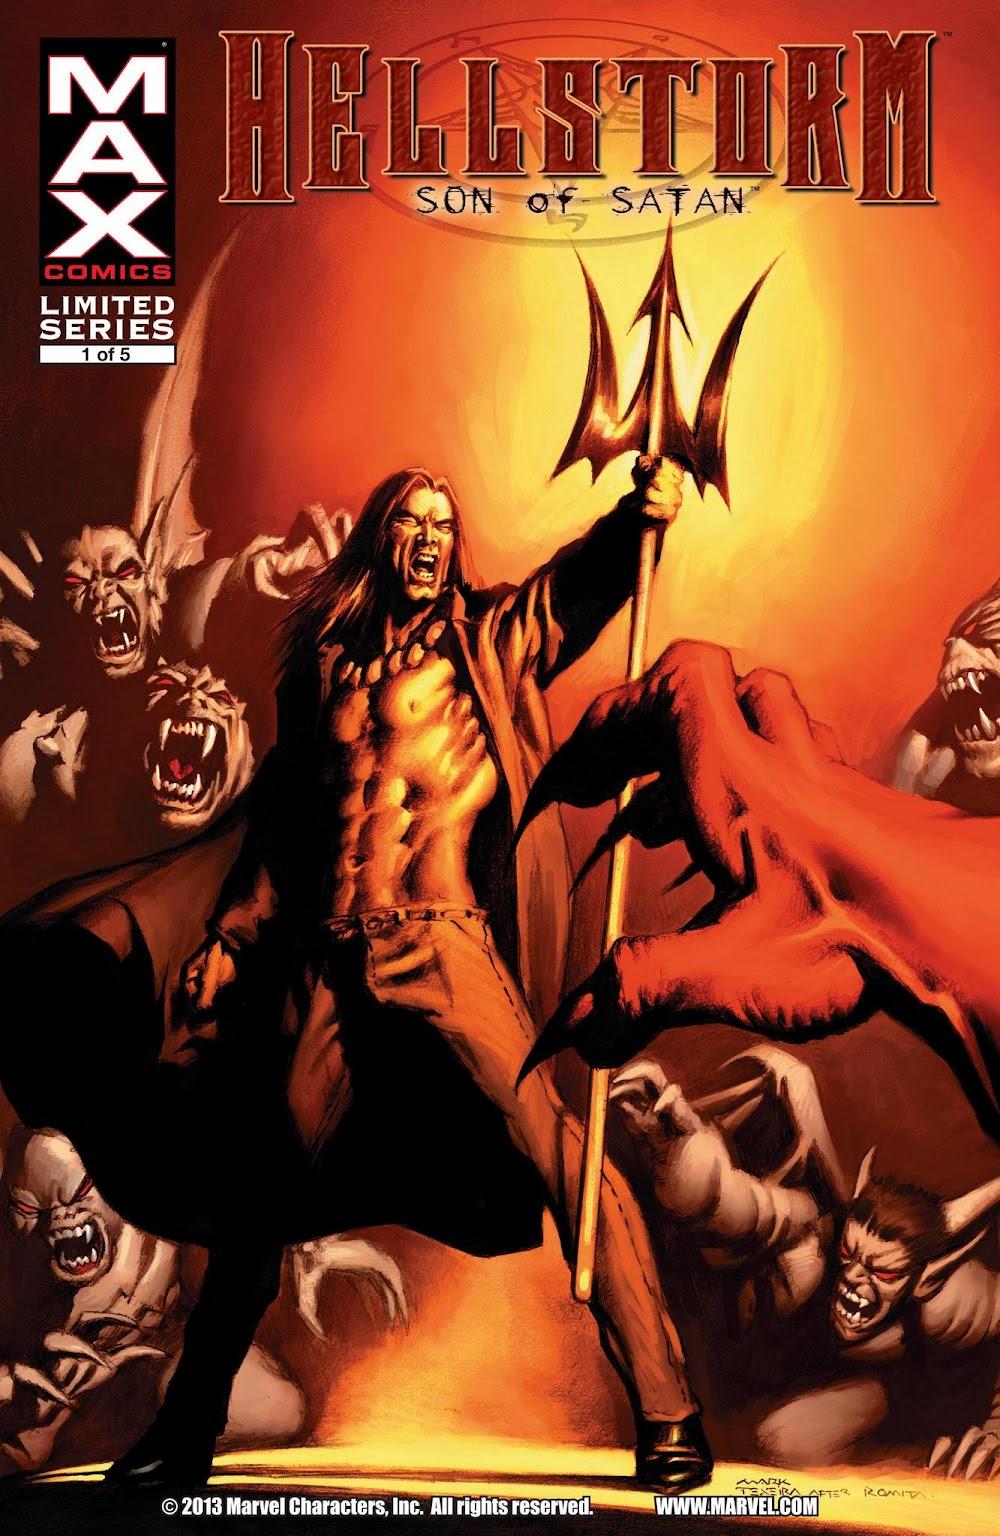 Hellstorm - Son of Satan (2006) - complete